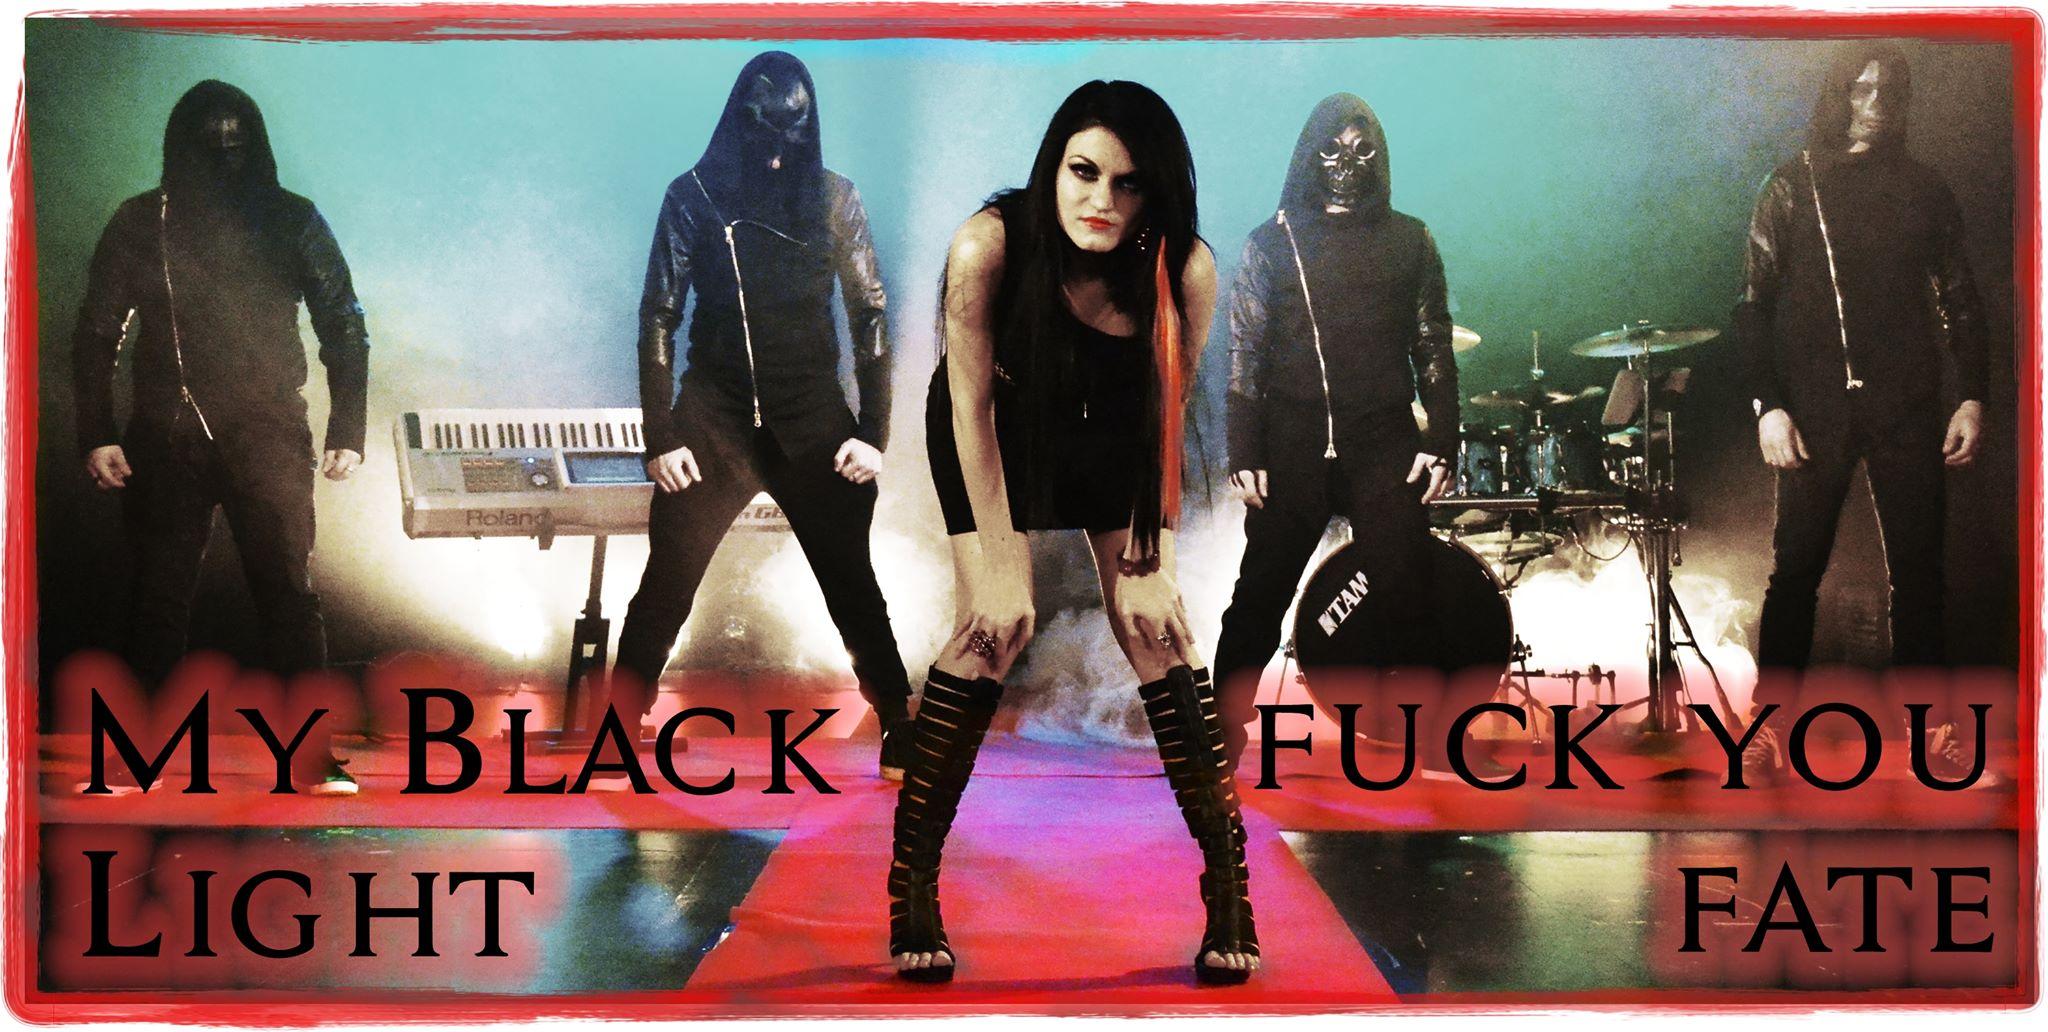 My Black Light Fuck You Fate